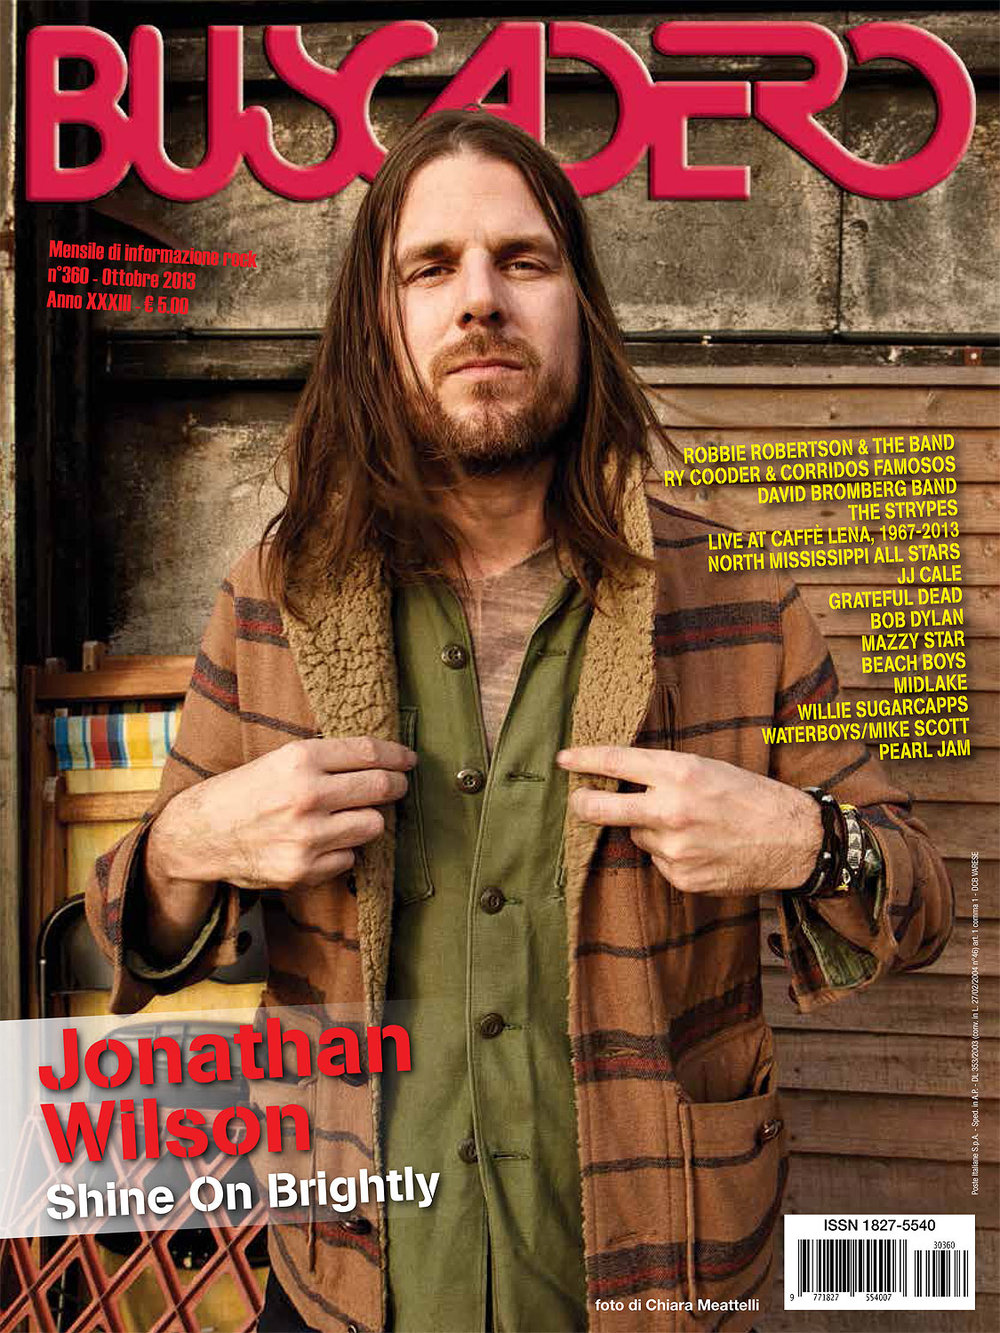 Buscadero: Jonathan Wilson cover photo & cover story